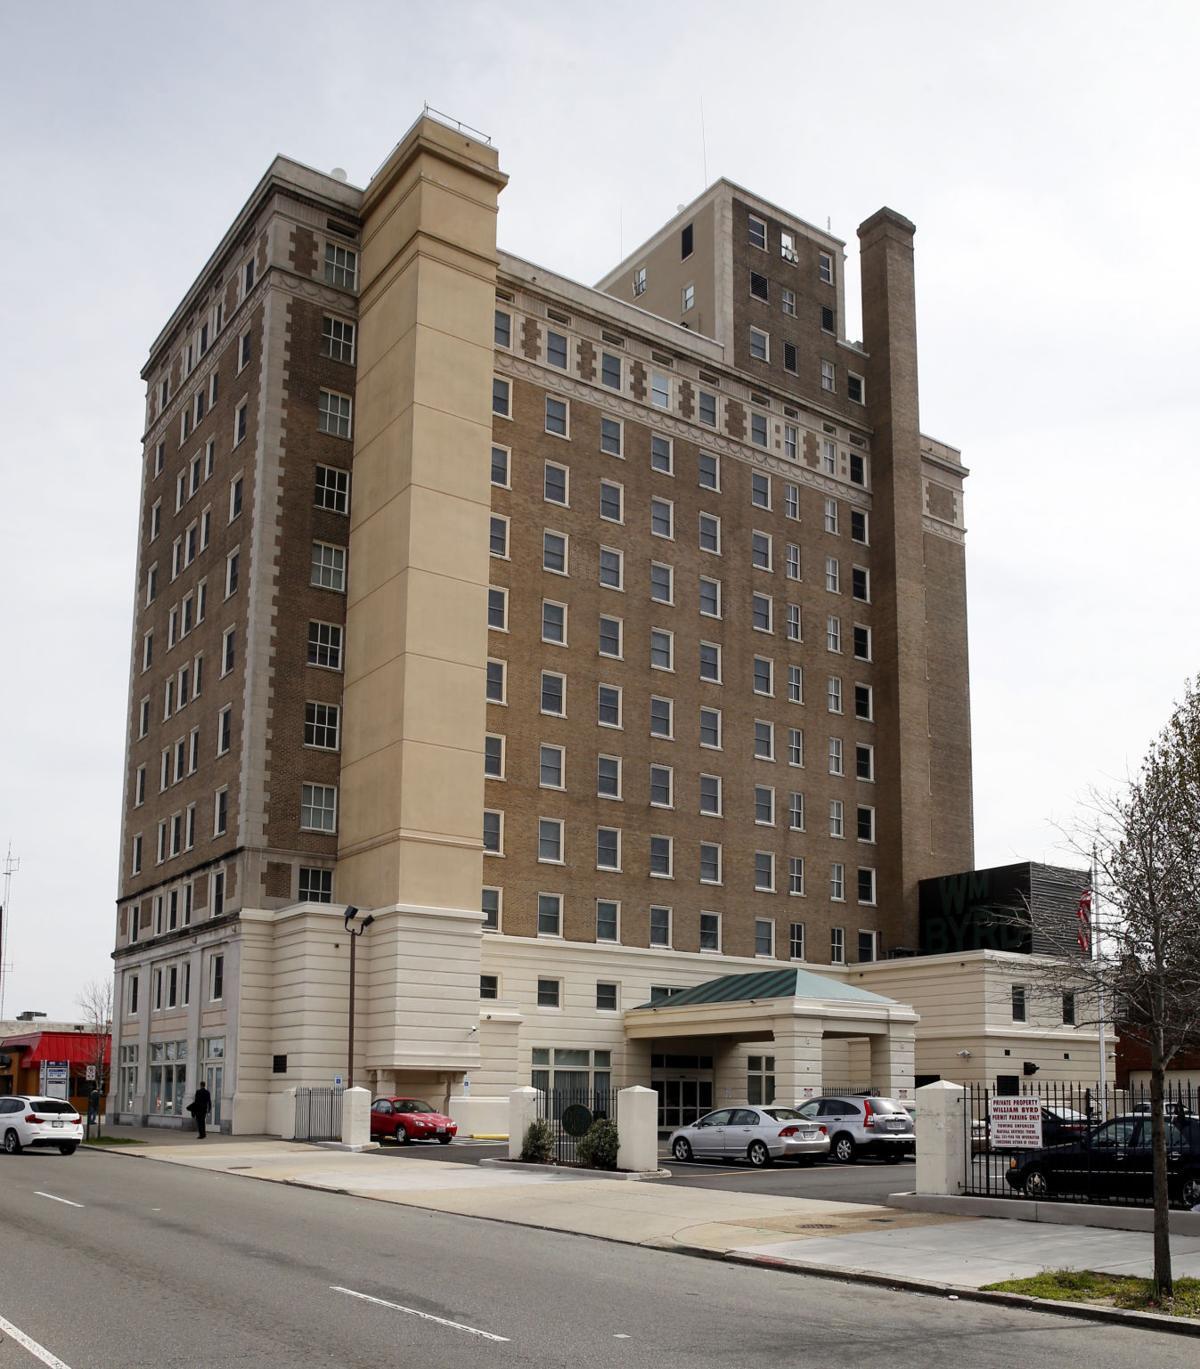 Image of William Byrd Senior Apartments in Richmond, Virginia